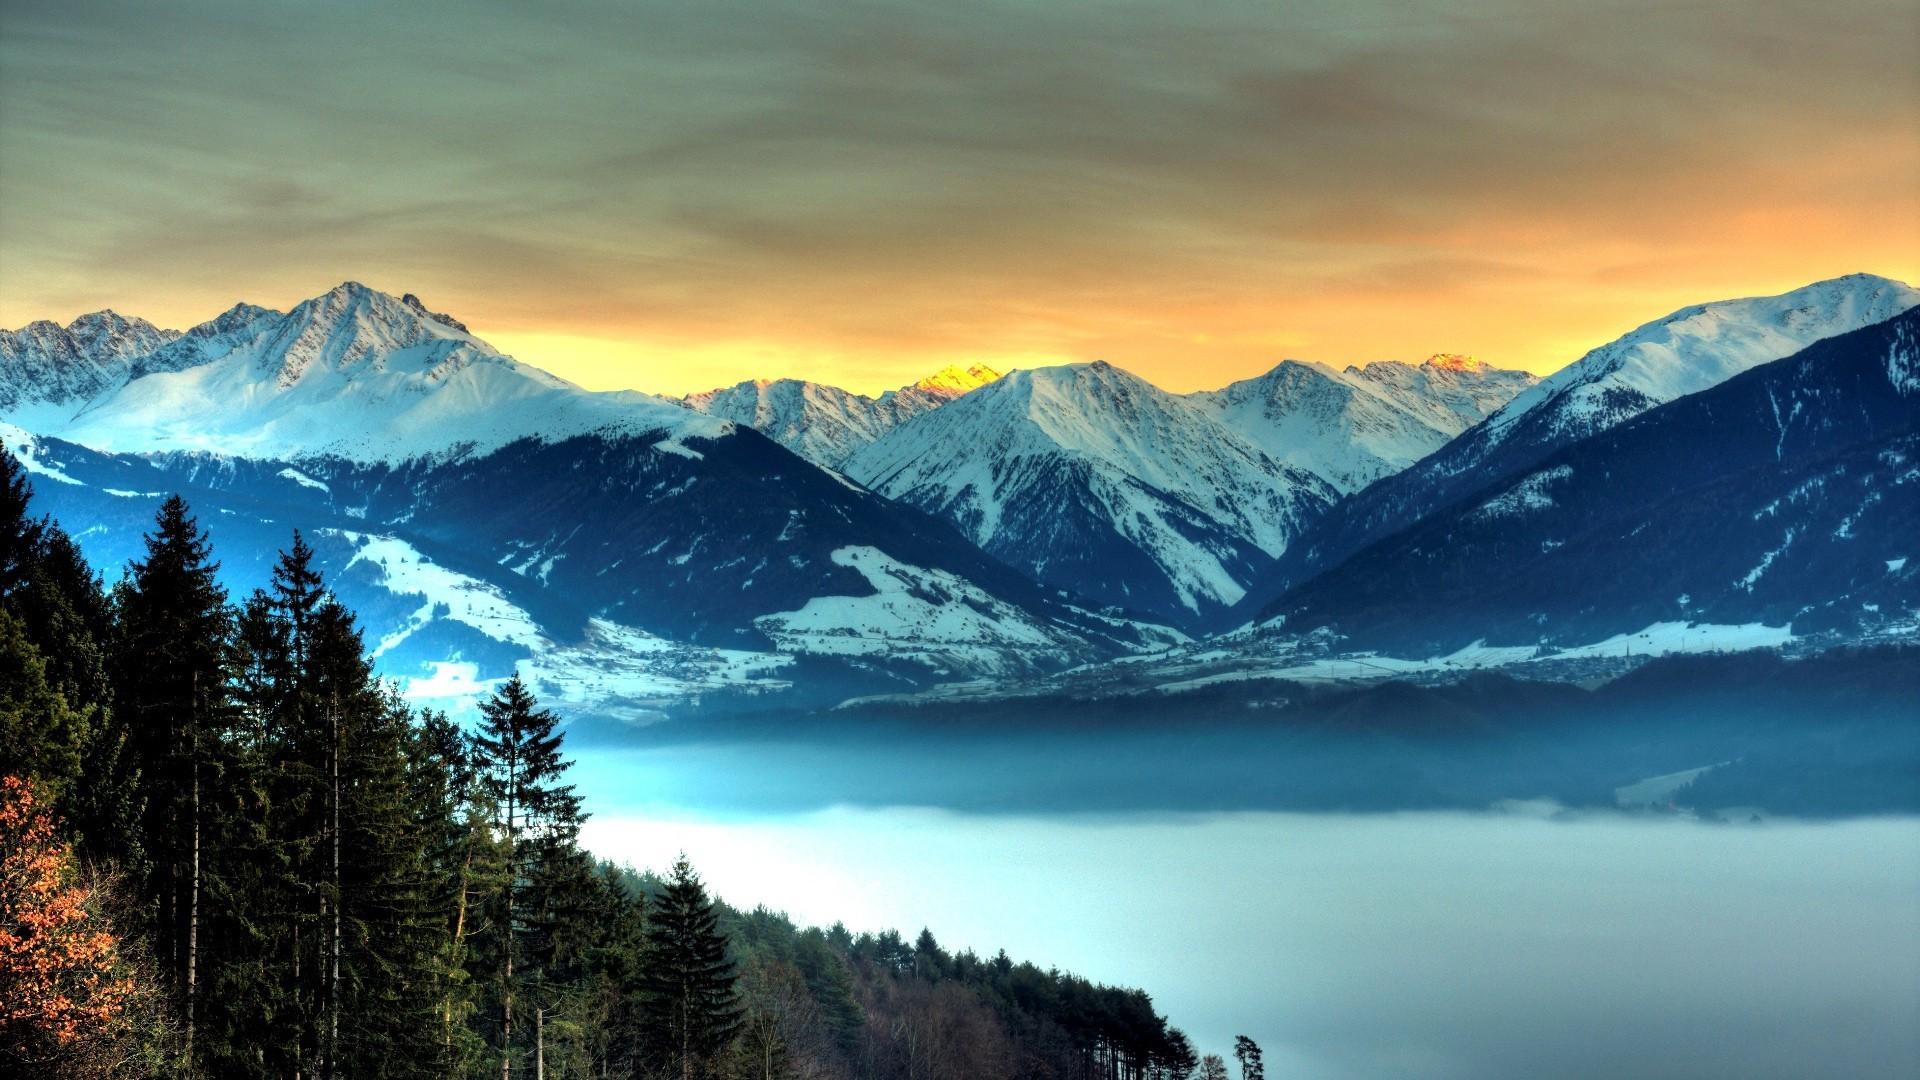 snowy mountains 27142 1920x1080px